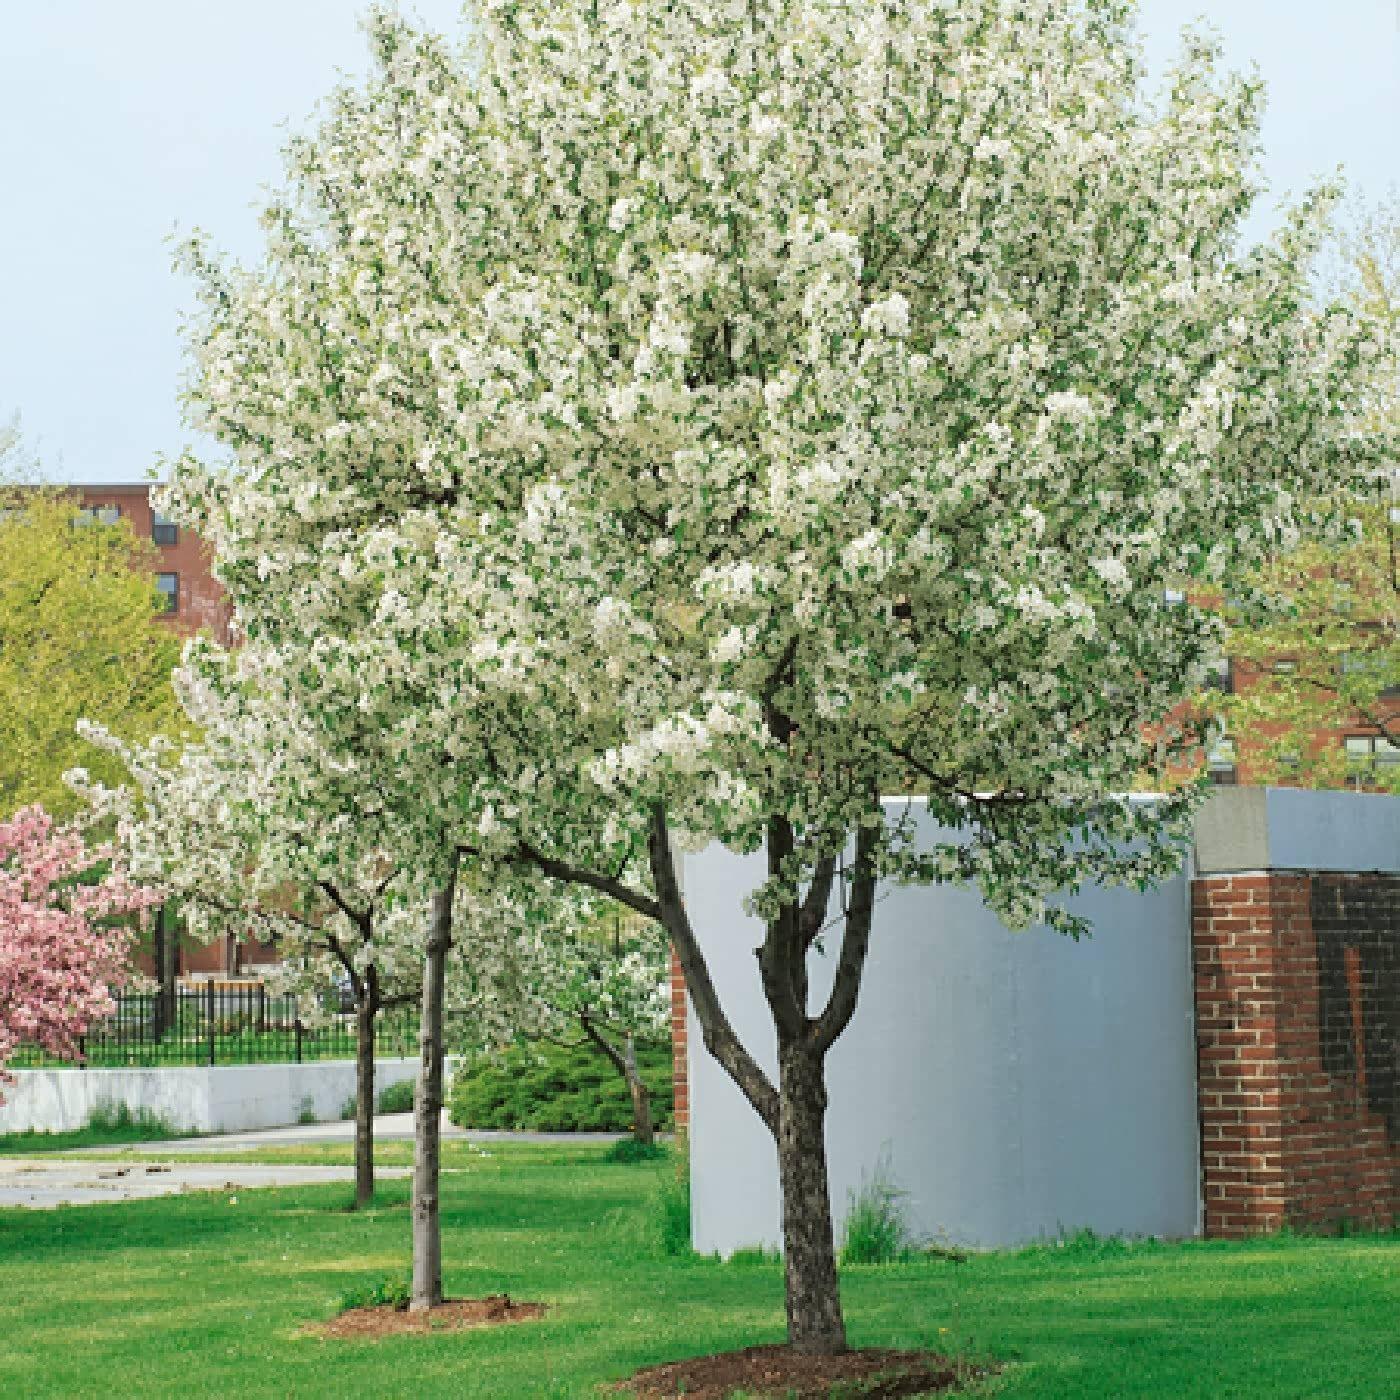 Malus John Downie Crab Apple Tree Apple tree blossoms